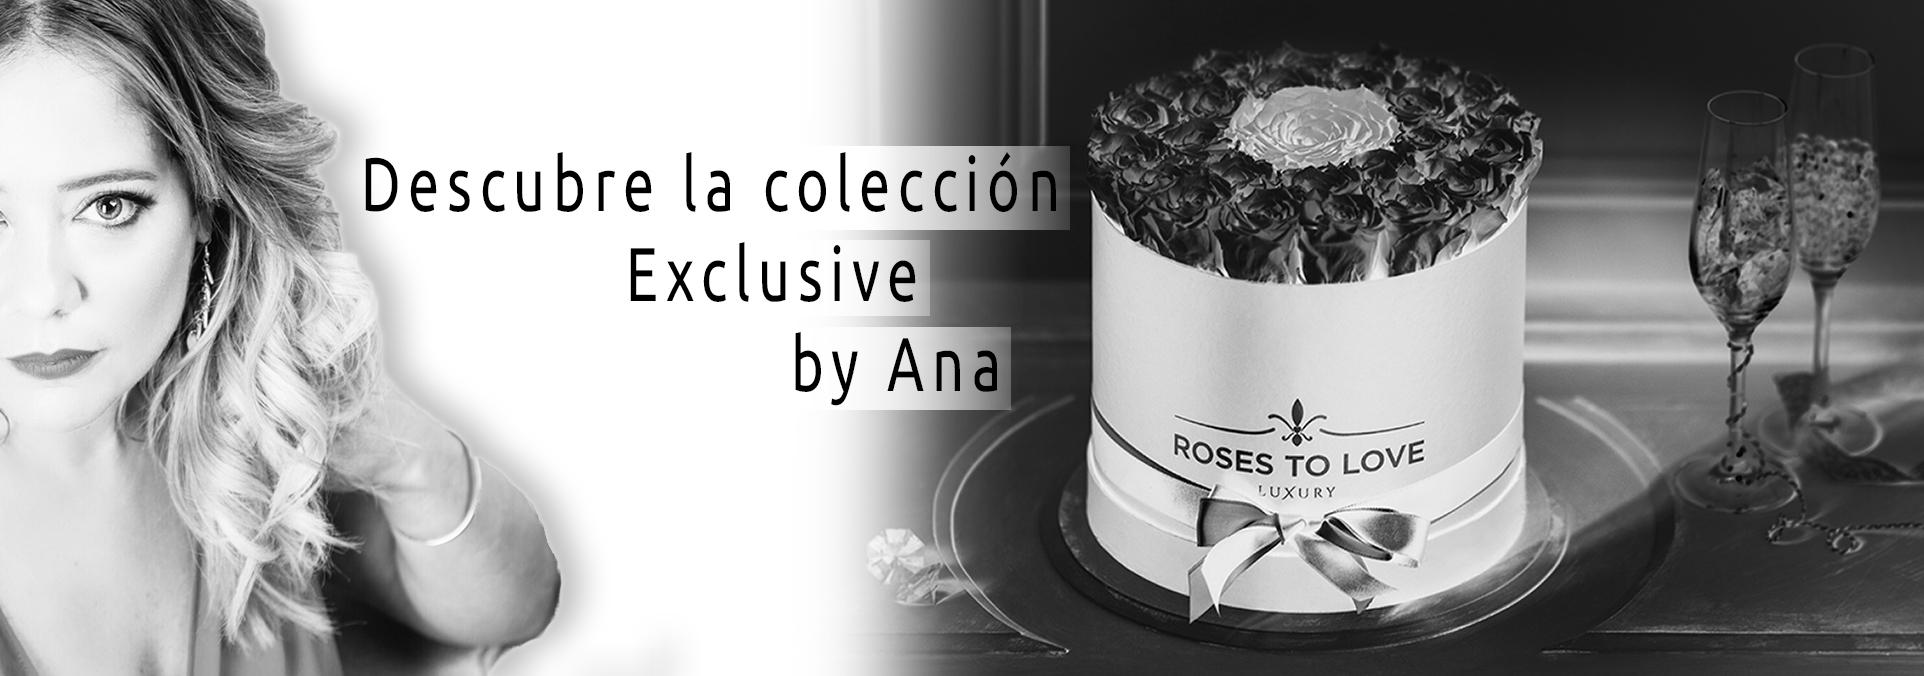 Colección Exclusive Roses to Love